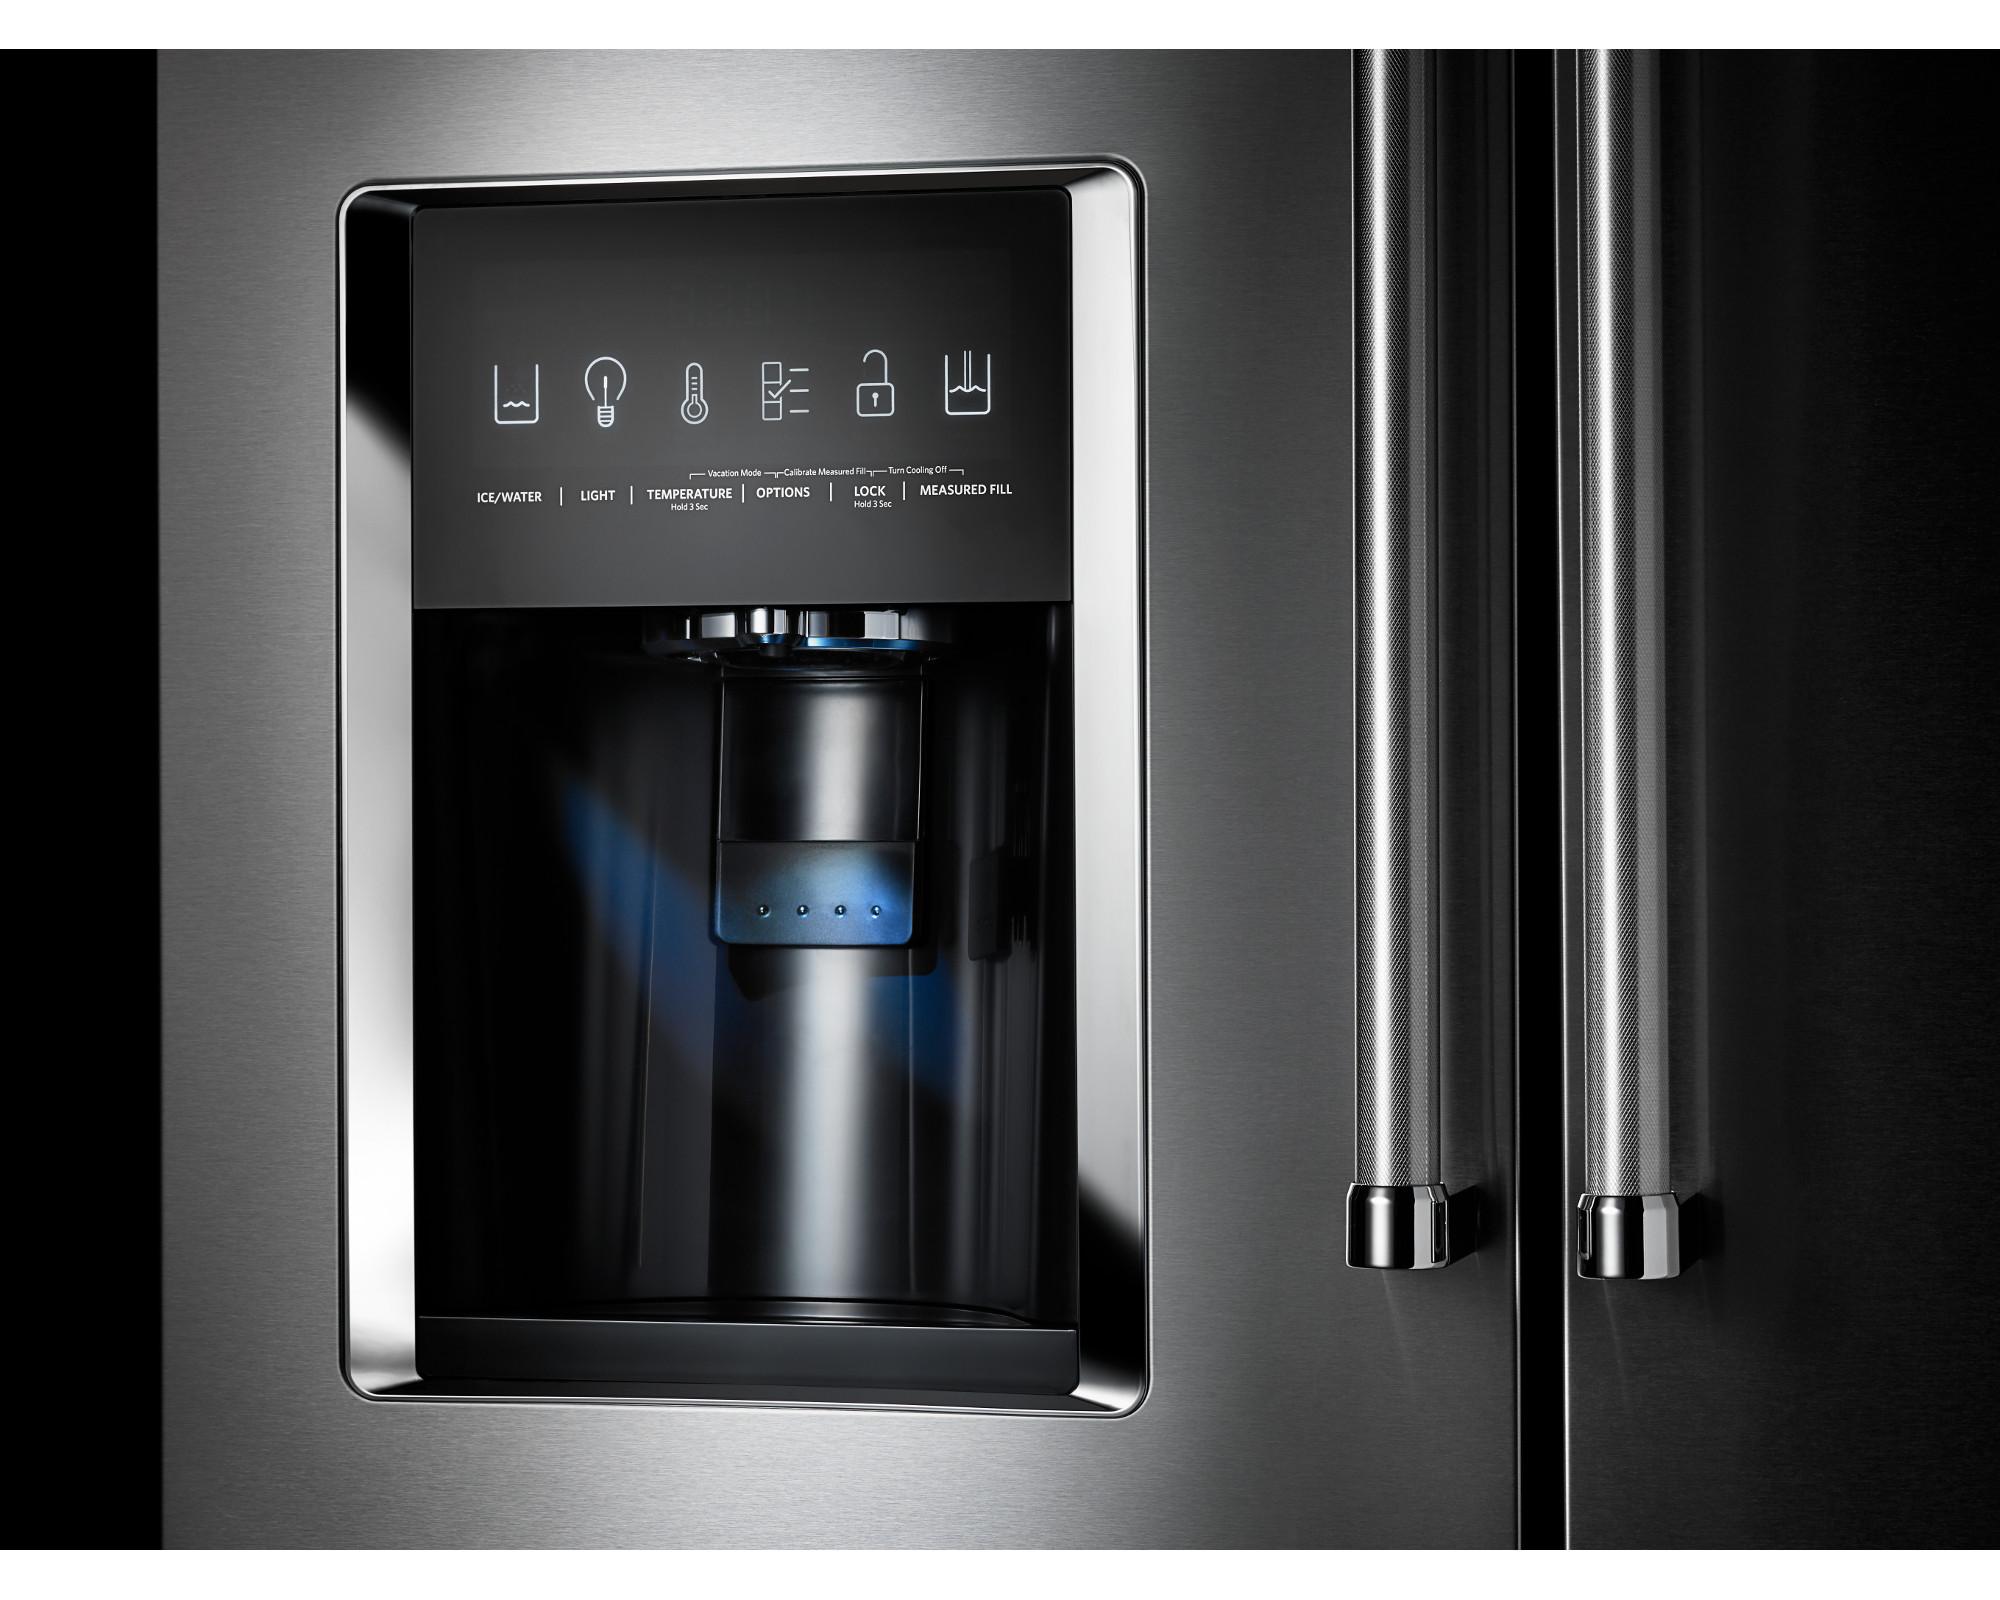 KitchenAid KRMF606ESS 25.8 cu. ft. Multi-Door Freestanding Refrigerator - Stainless Steel